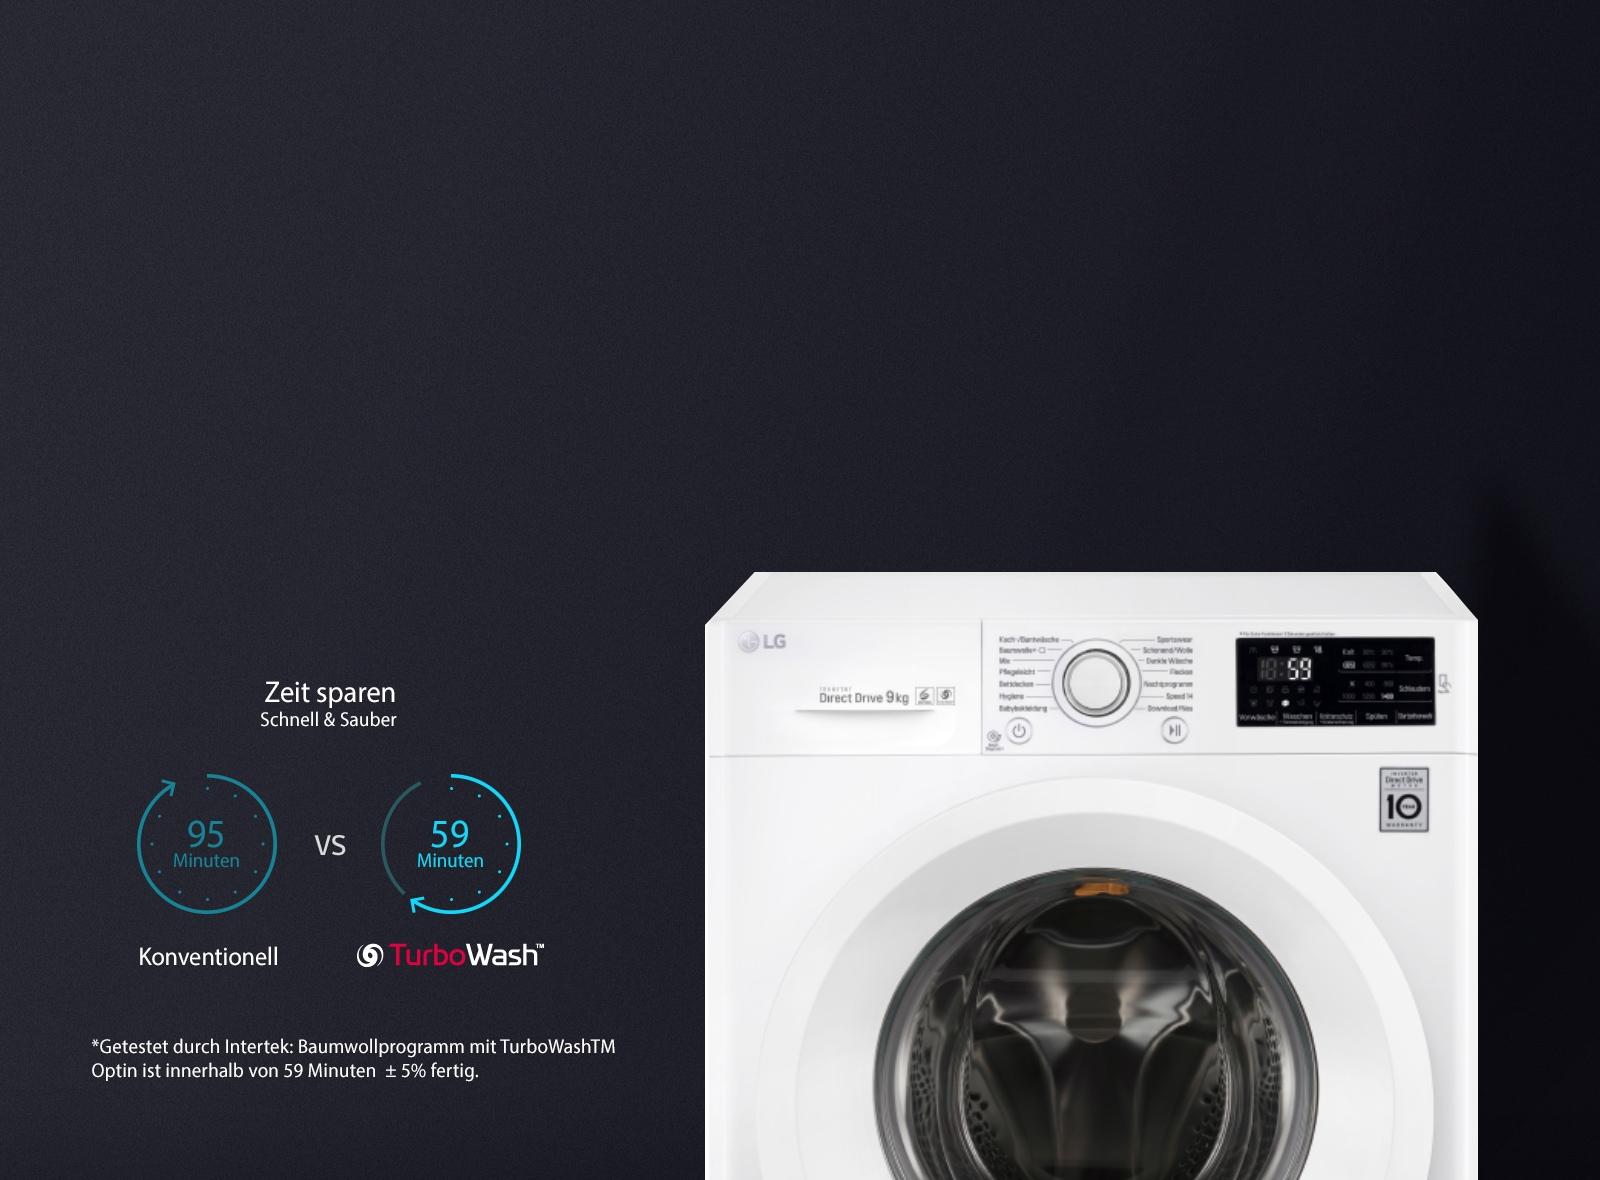 http://www.lg.com/de/images/WM/features/Global_WM_Titan2_washer.jpg